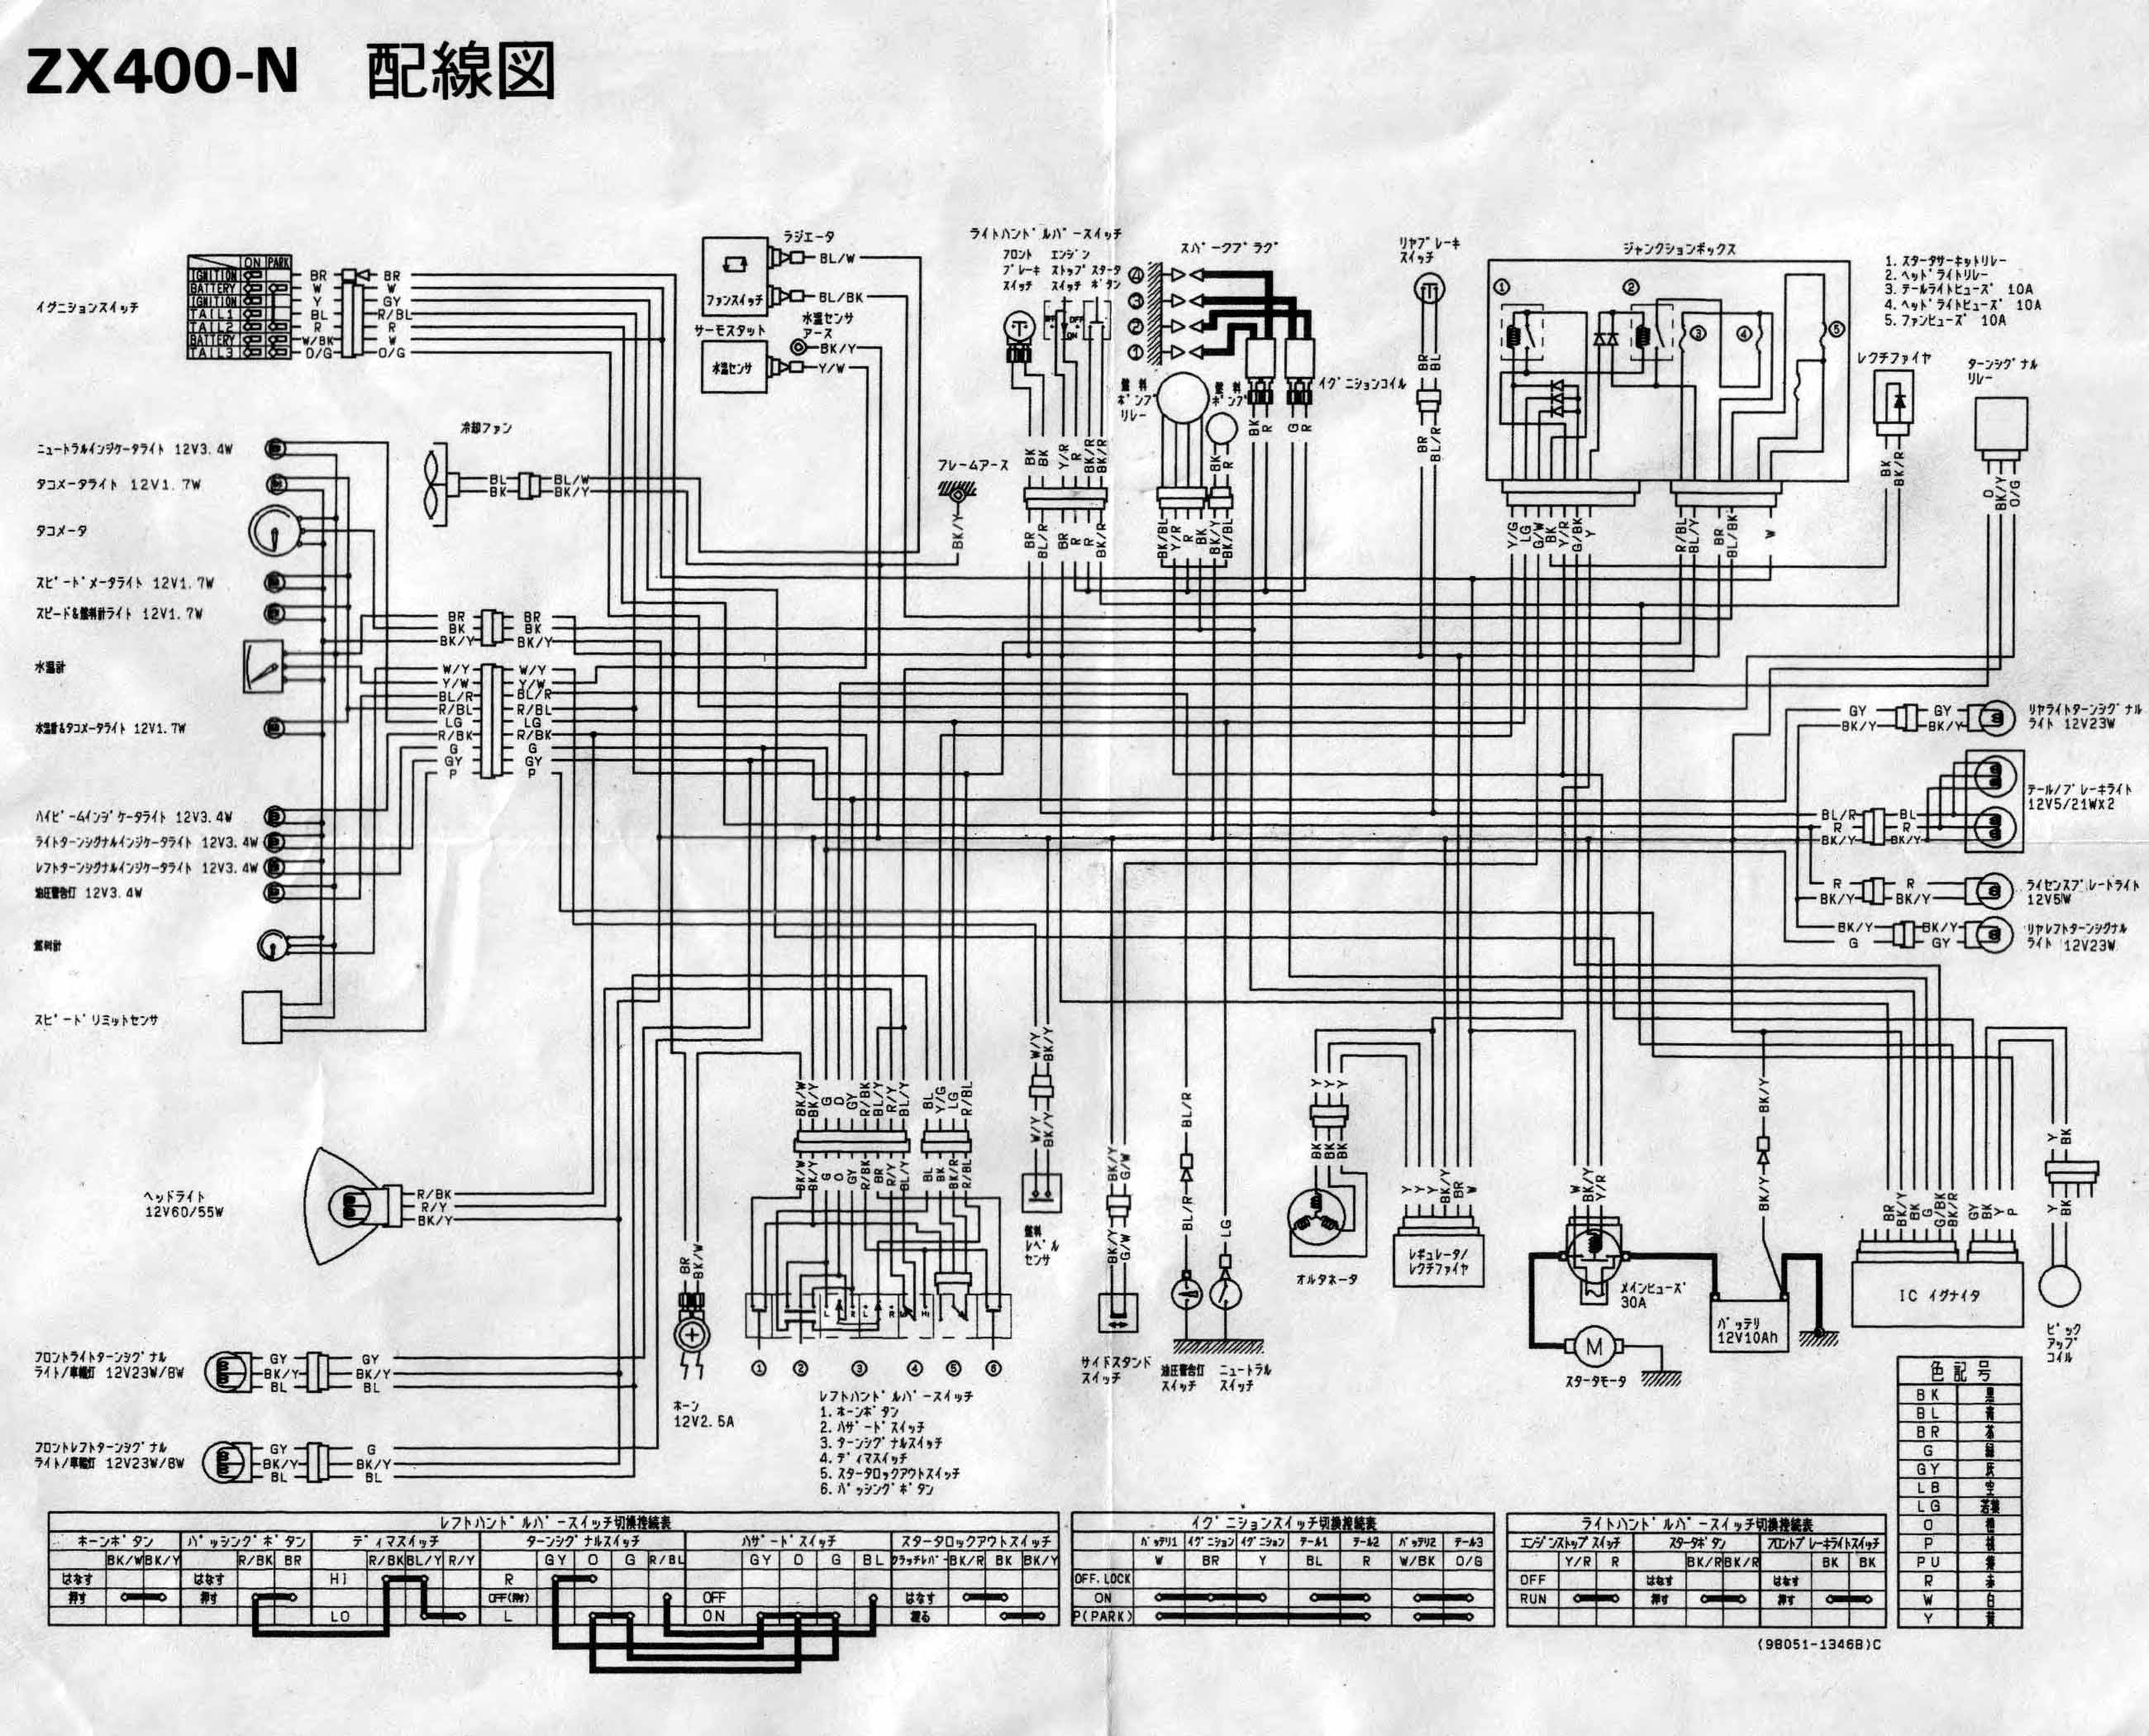 ninja 500r wiring diagram wiring diagrams Norton Commando Wiring Diagram kawasaki ninja 500 wiring diagram wiring diagramkawasaki ninja 500 wiring diagram designmethodsandprocesses co uk \\\\